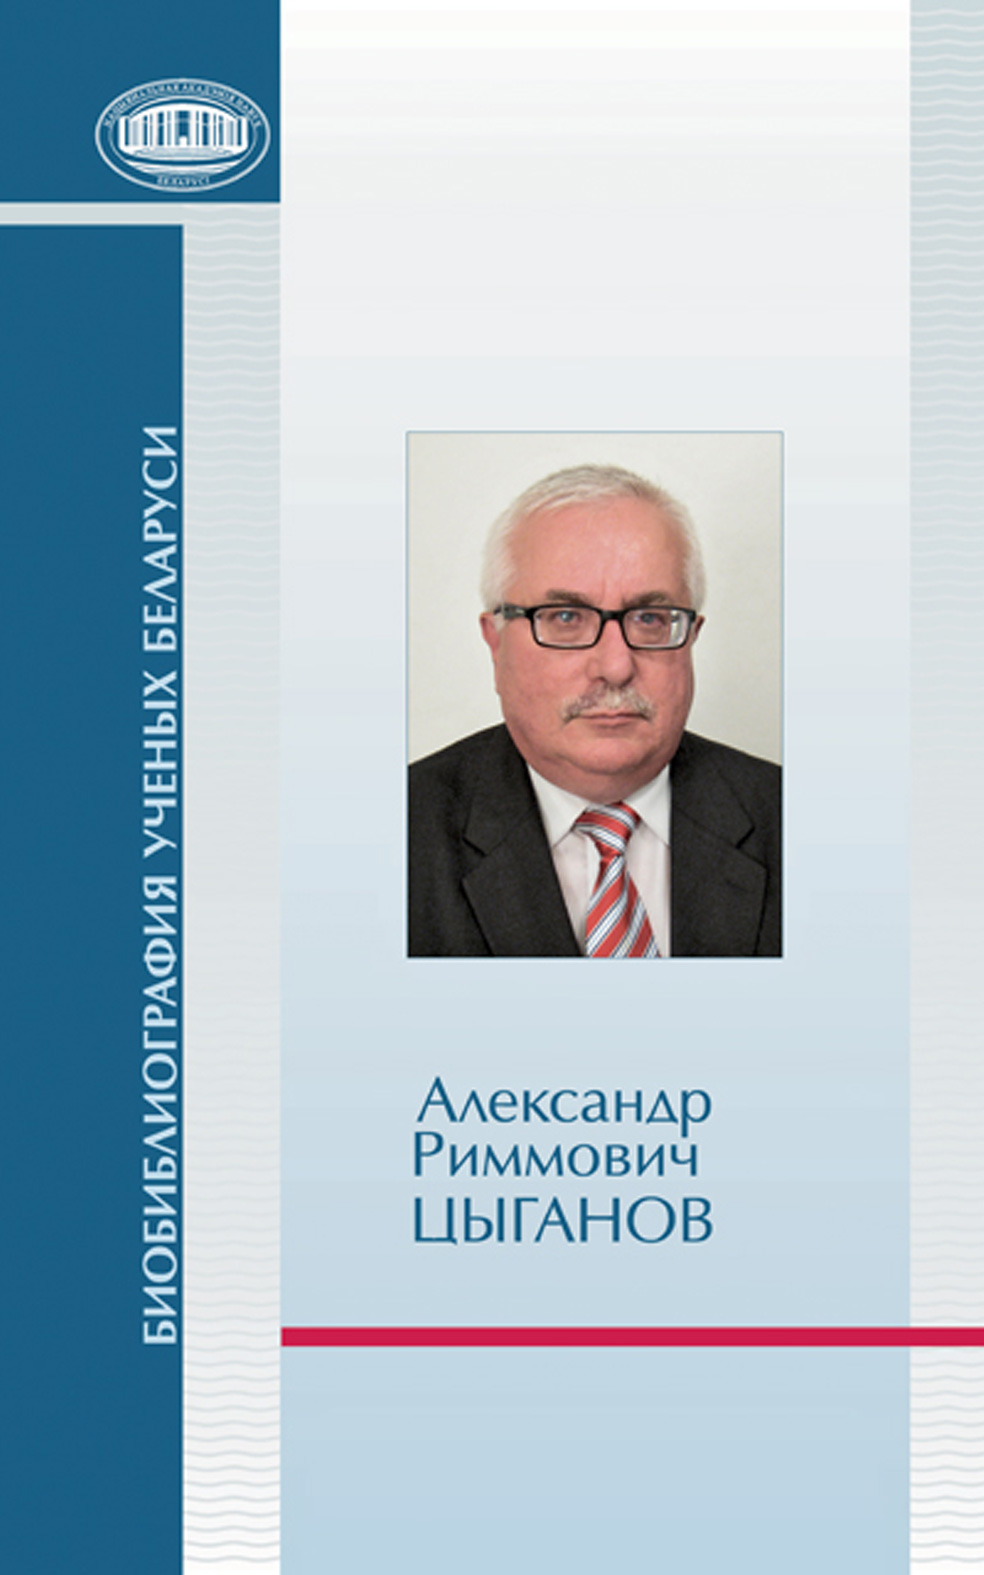 Александр Риммович Цыганов